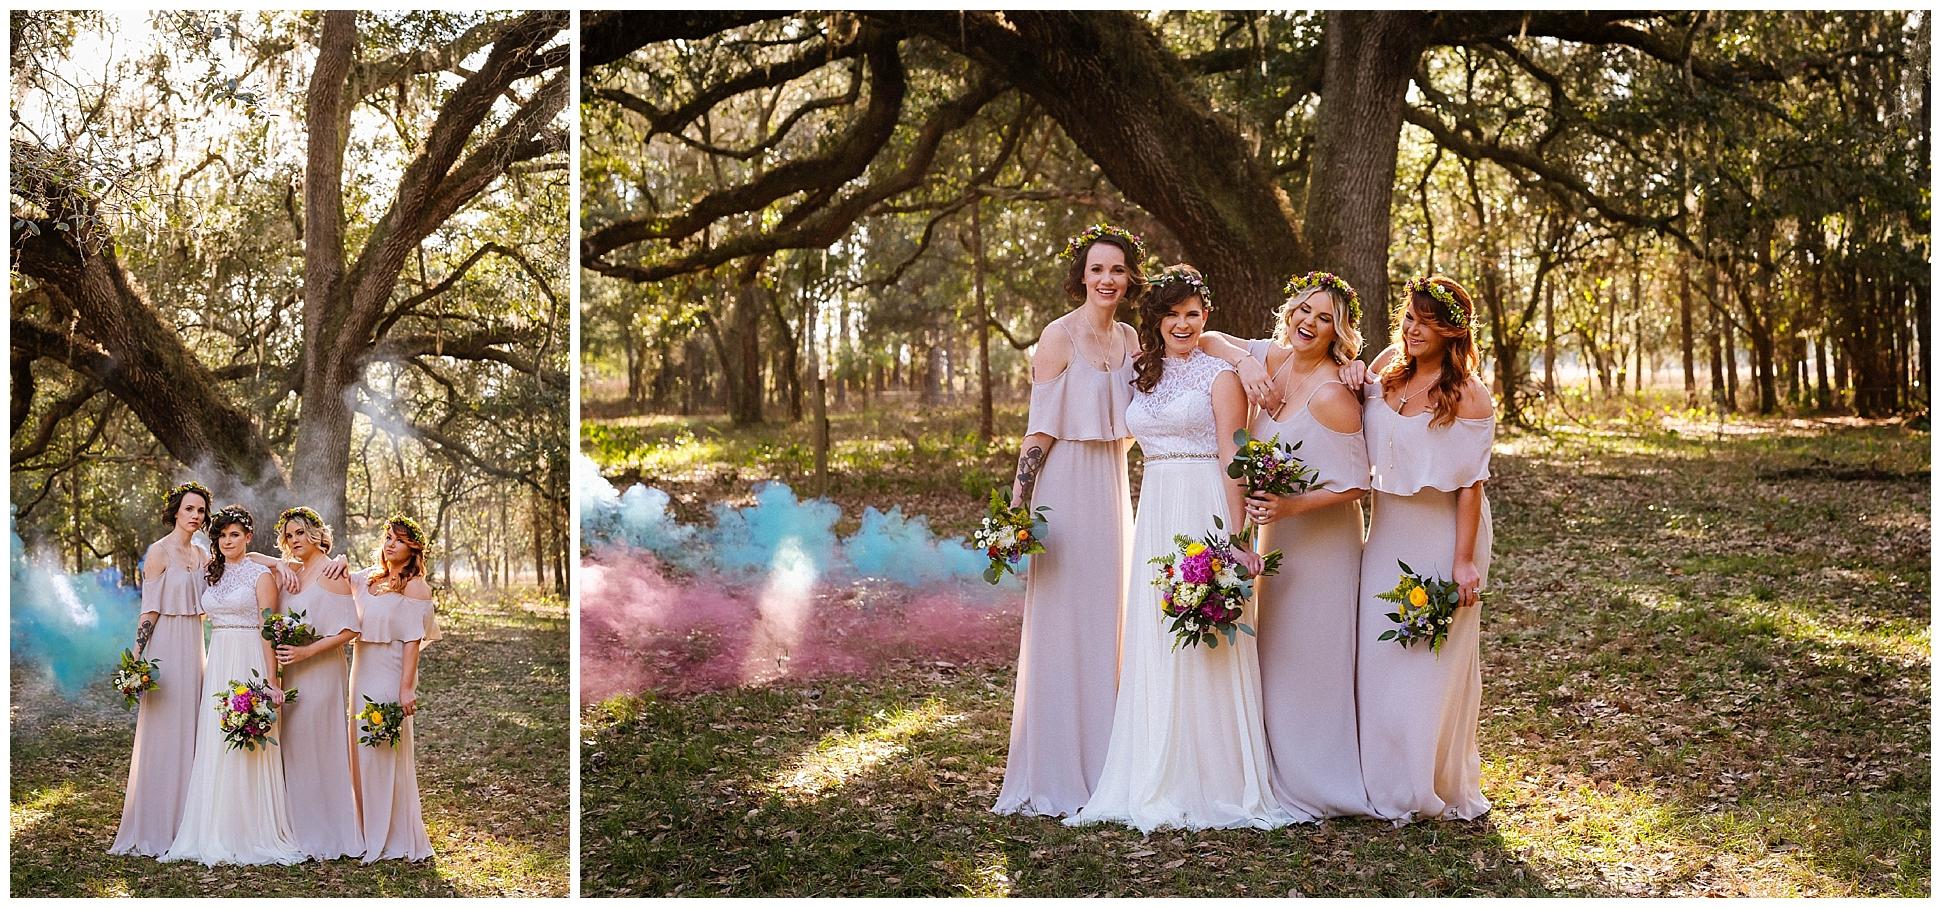 magical-outdoor-florida-wedding-smoke-bombs-flowers-crown-beard_0022.jpg